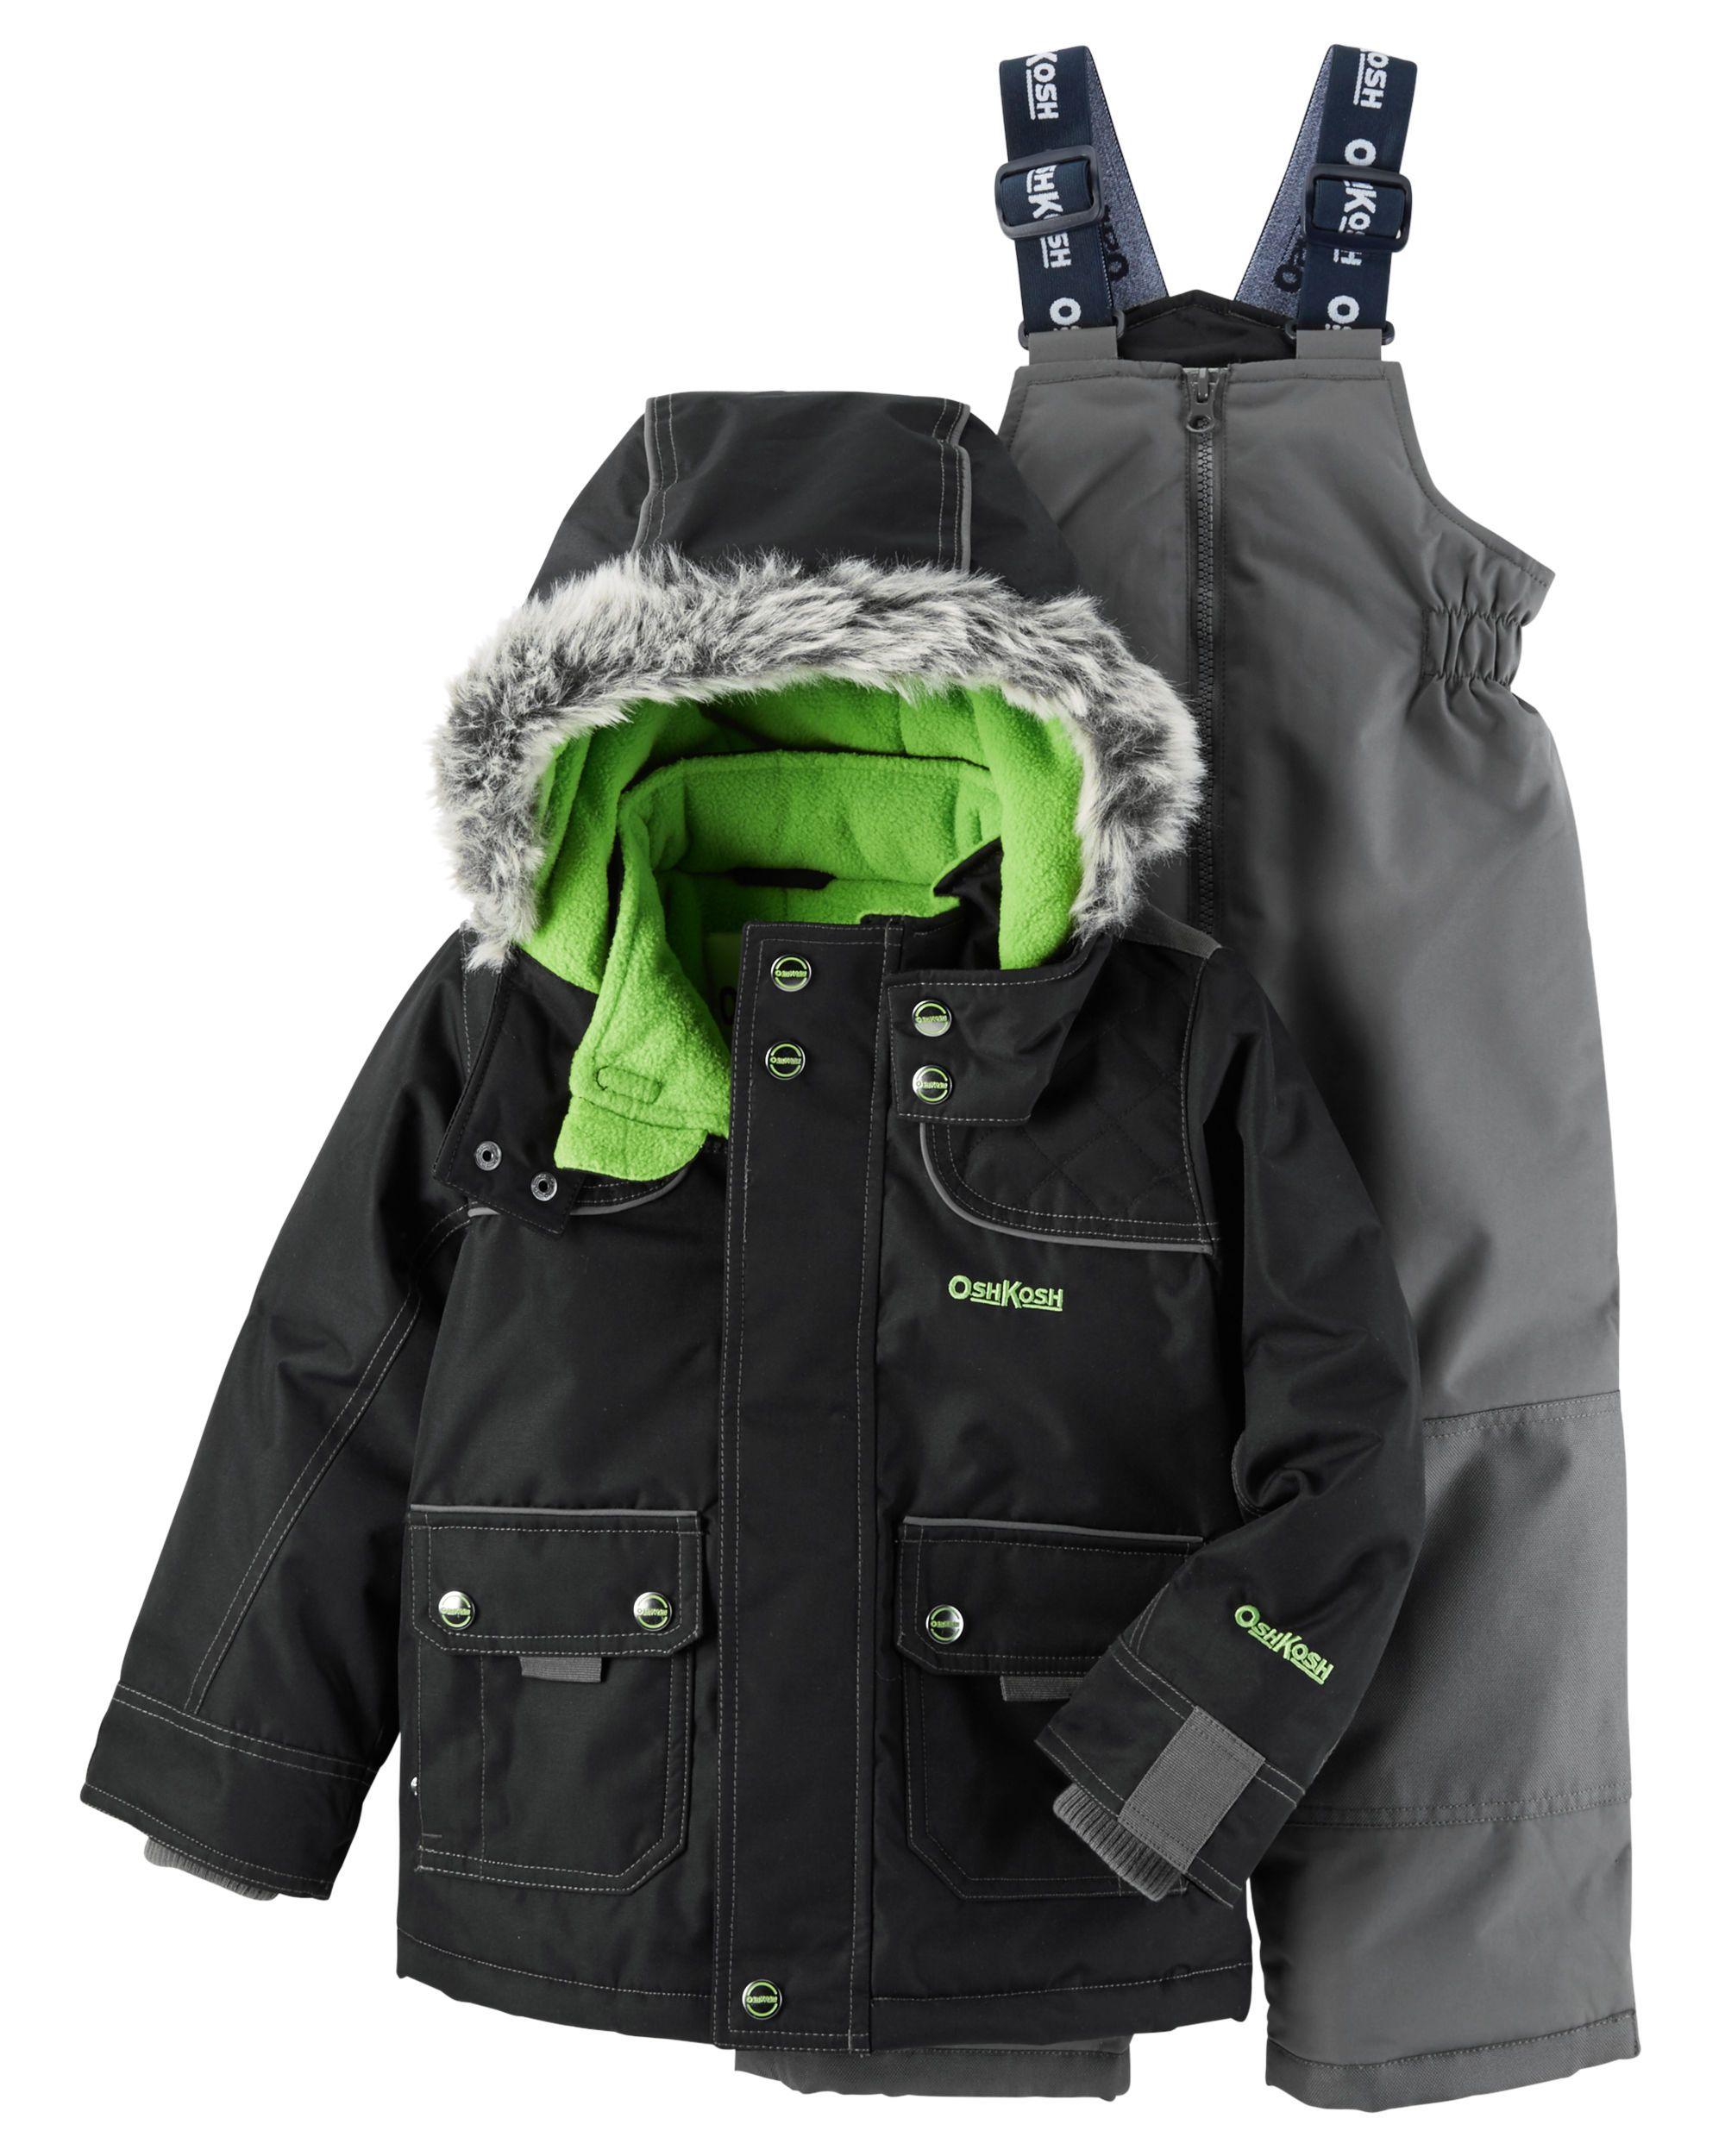 e02a32422 Toddler Boy 4-Piece Fleece-Lined Snowsuit Set